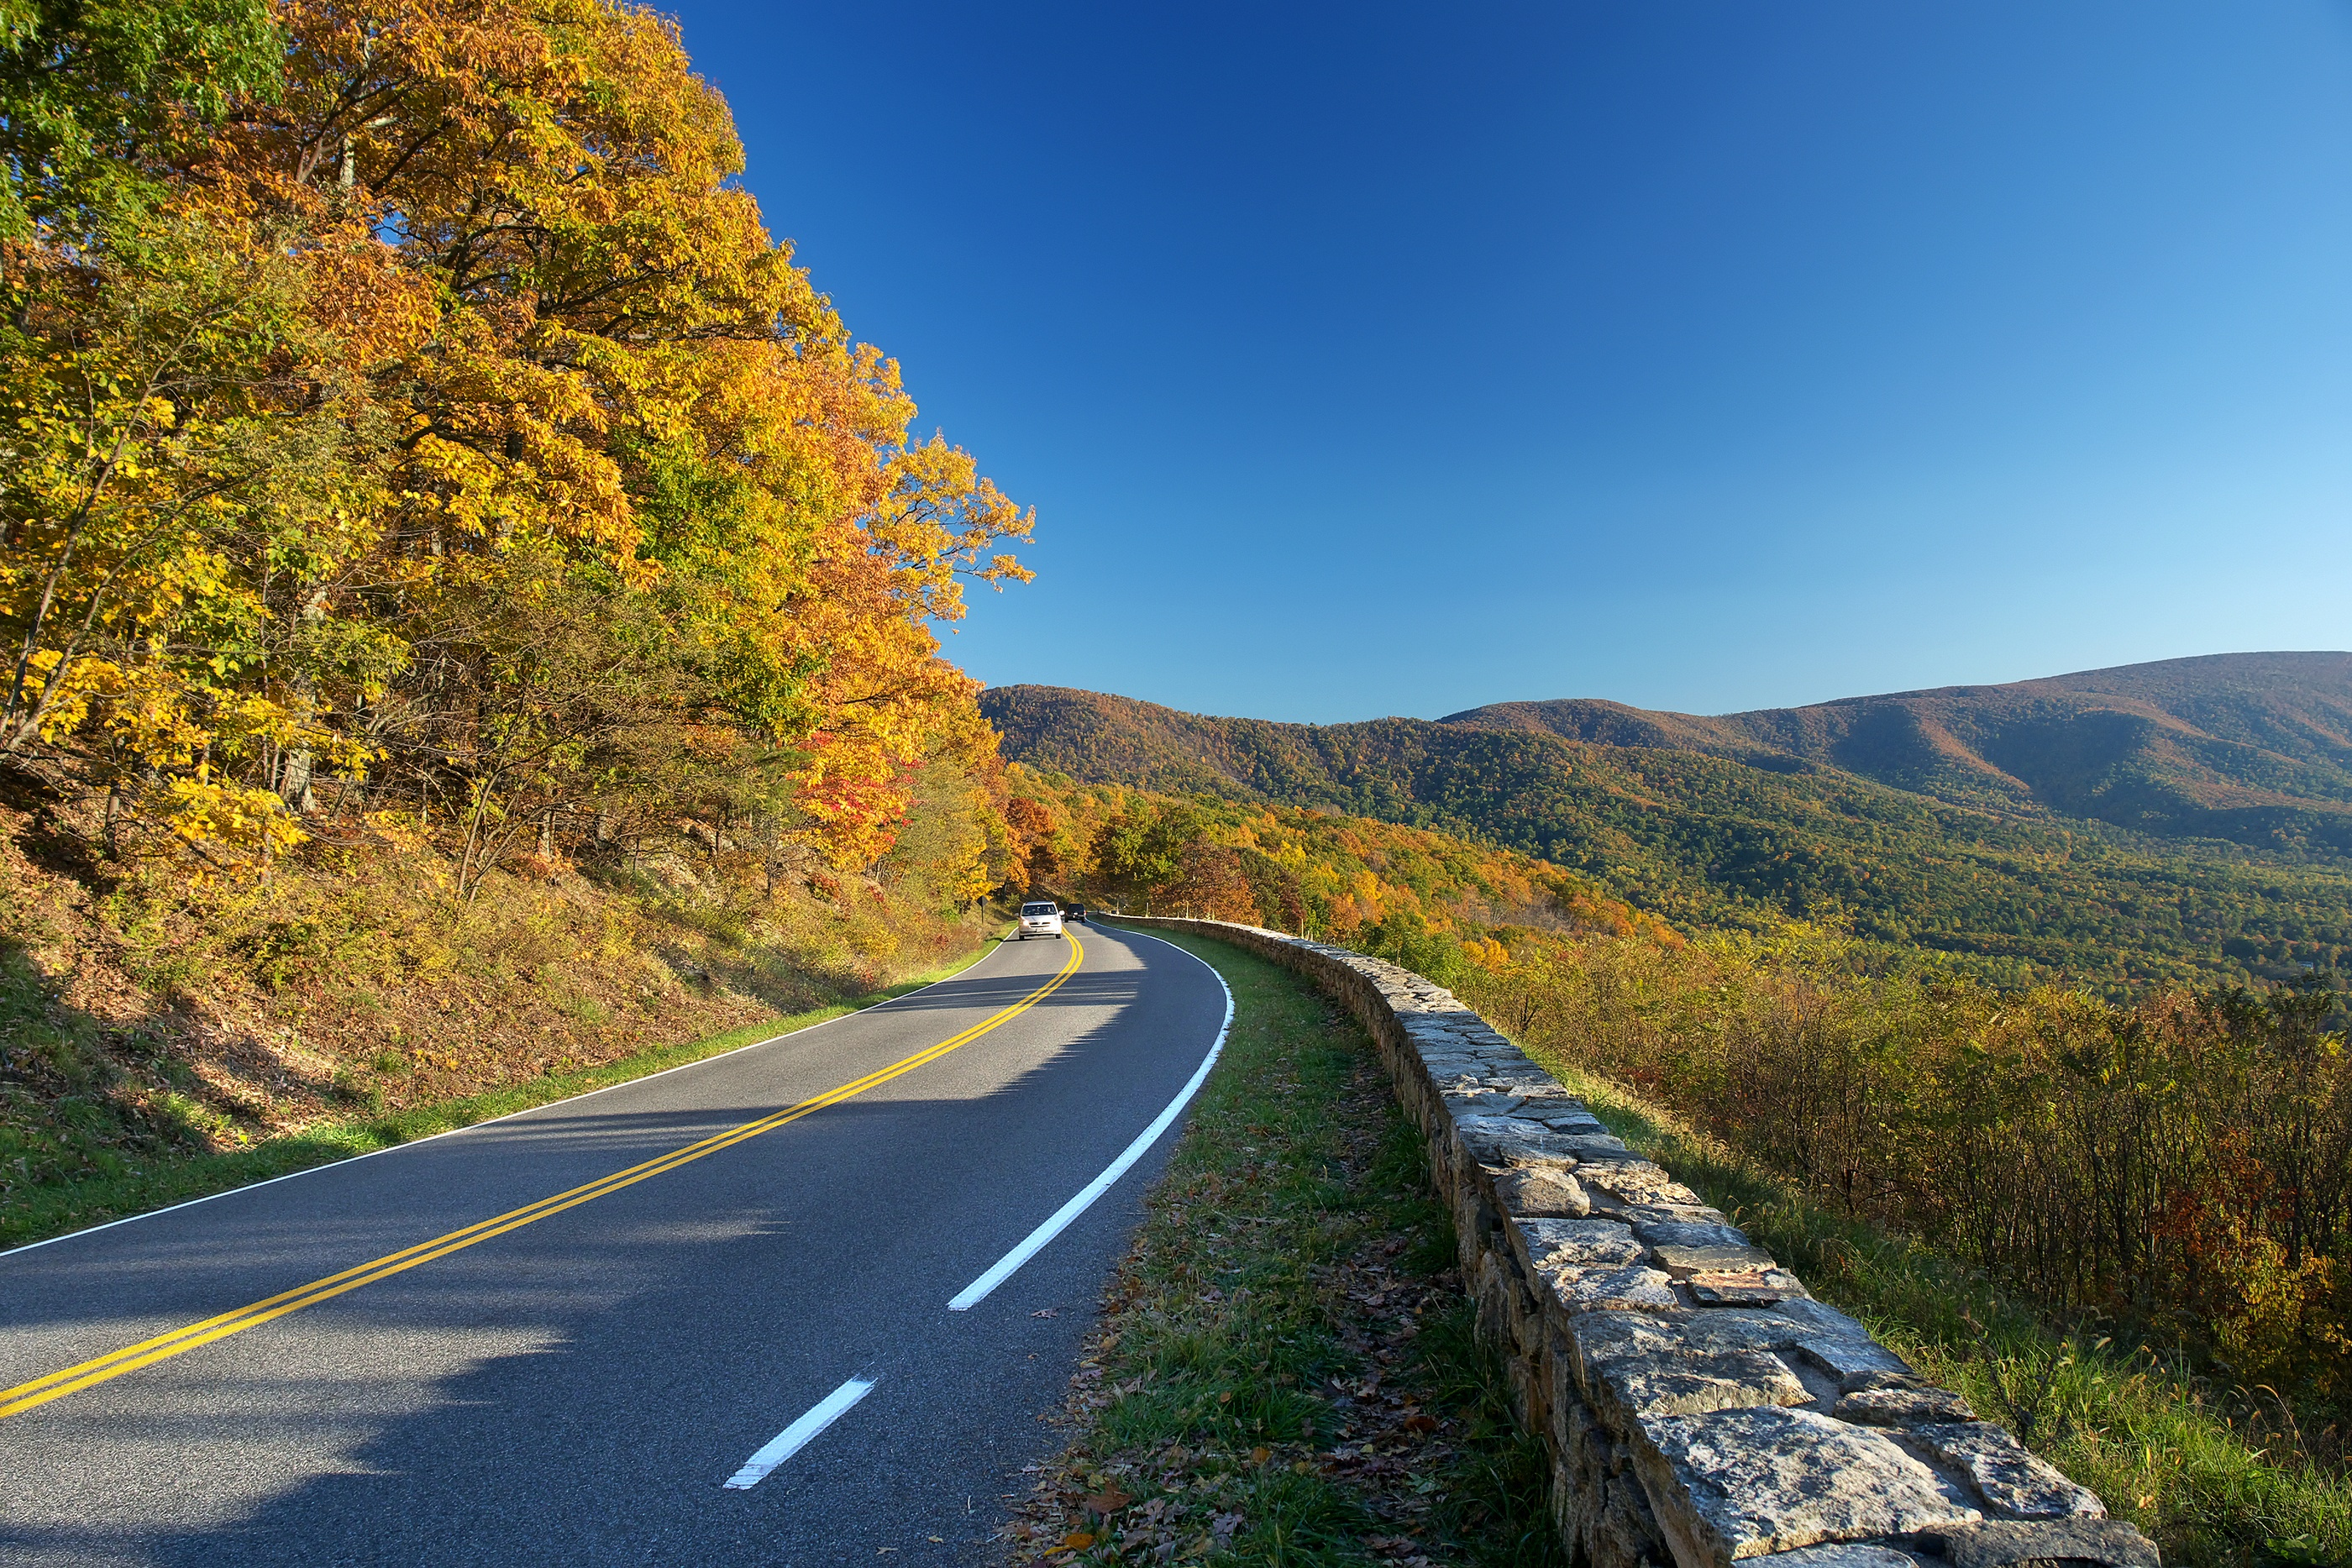 bigstock-Road-In-Shenandoah-National-Pa-5463788.jpg